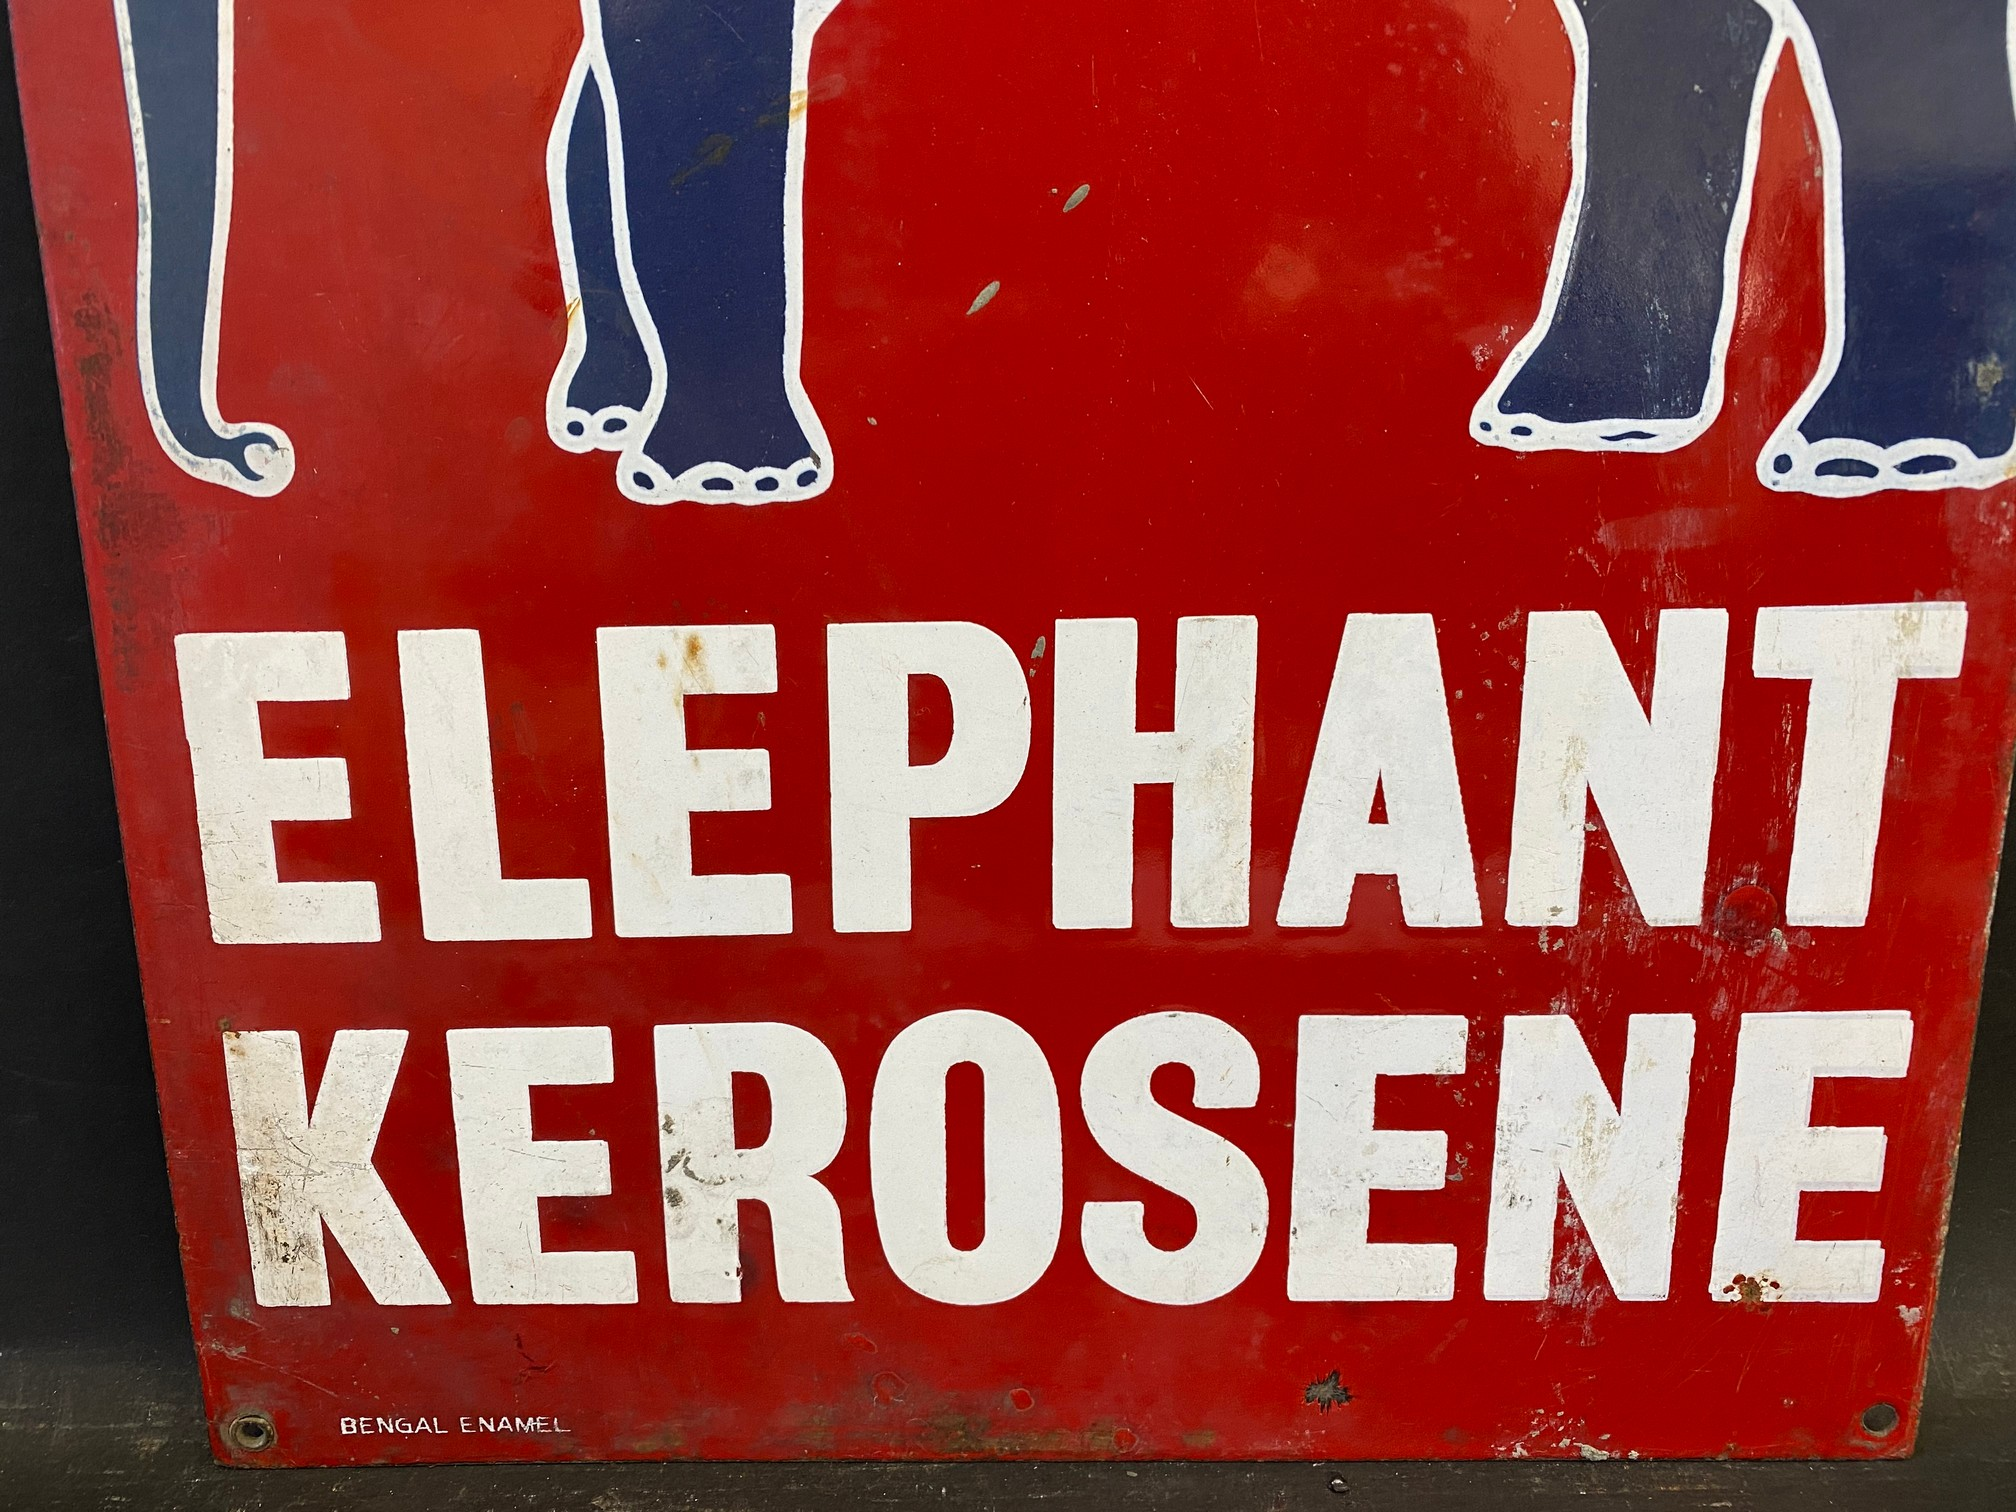 "An Indian Esso Elephant Kerosene pictorial enamel sign by Bengal Enamel, 12 x 24"". - Image 3 of 4"